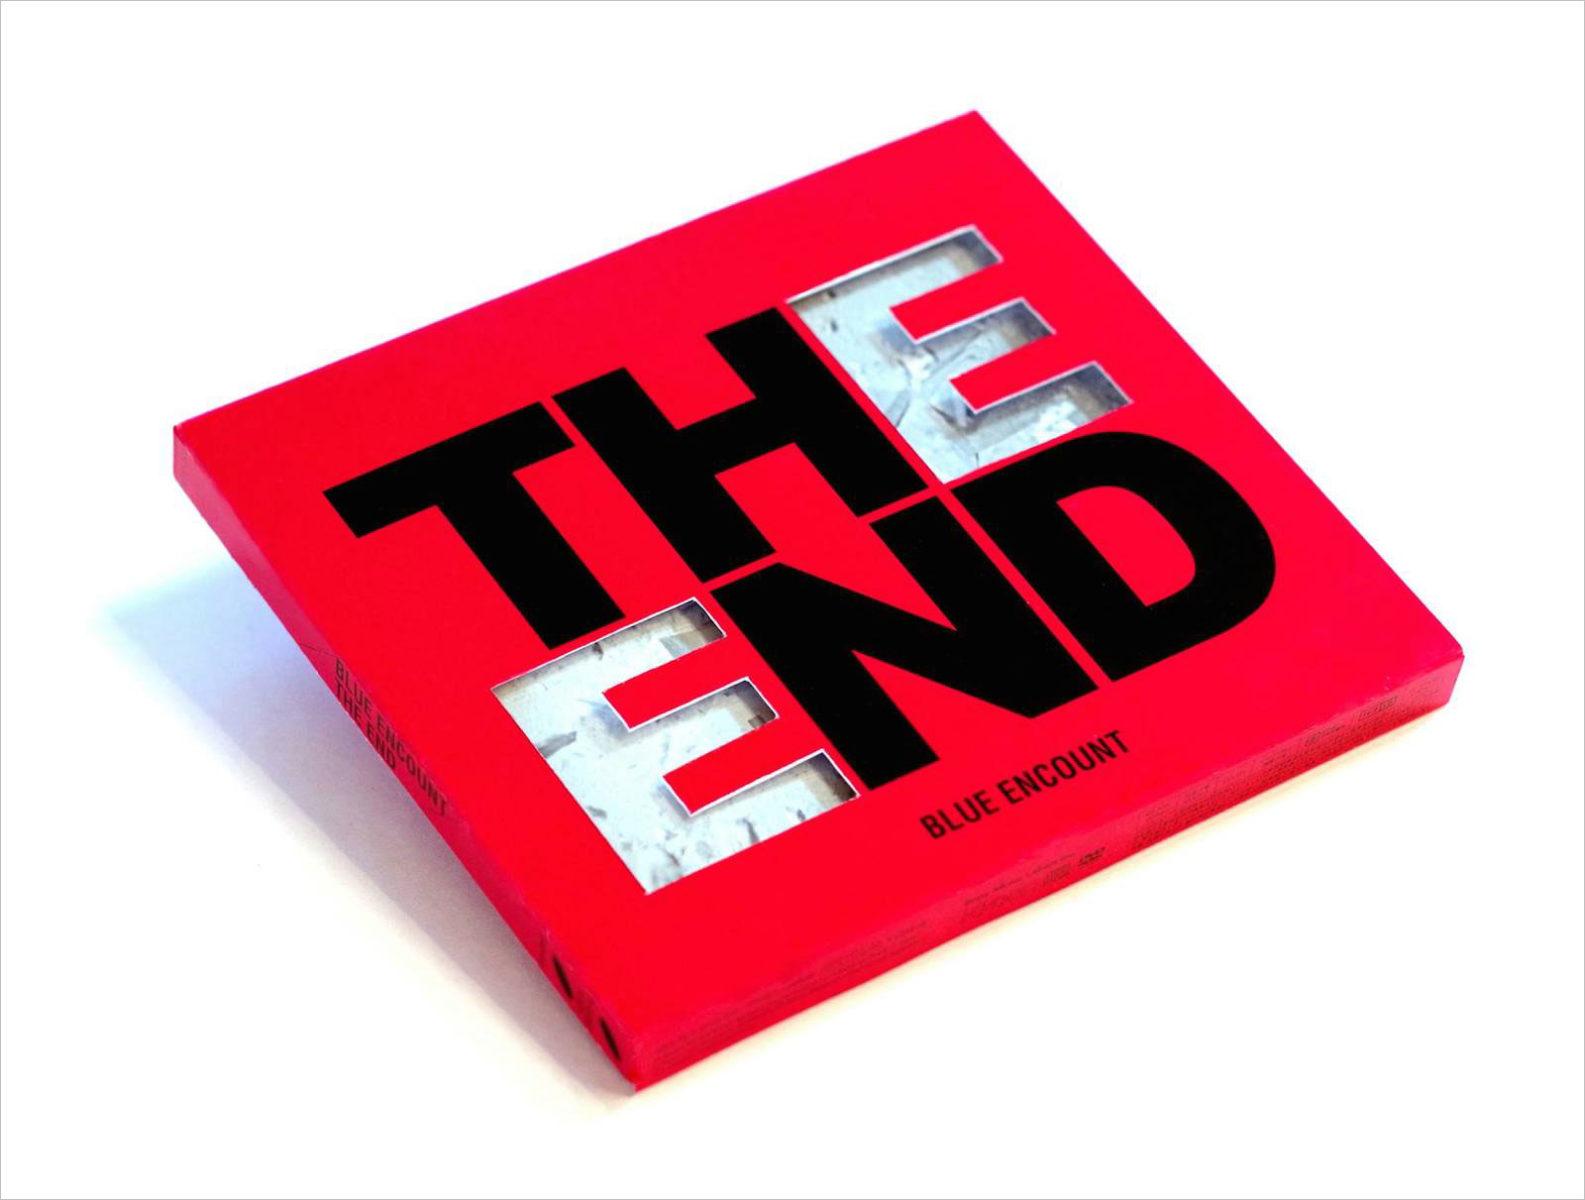 BLUE ENCOUNT『THE END』 / CDジャケットデザイン